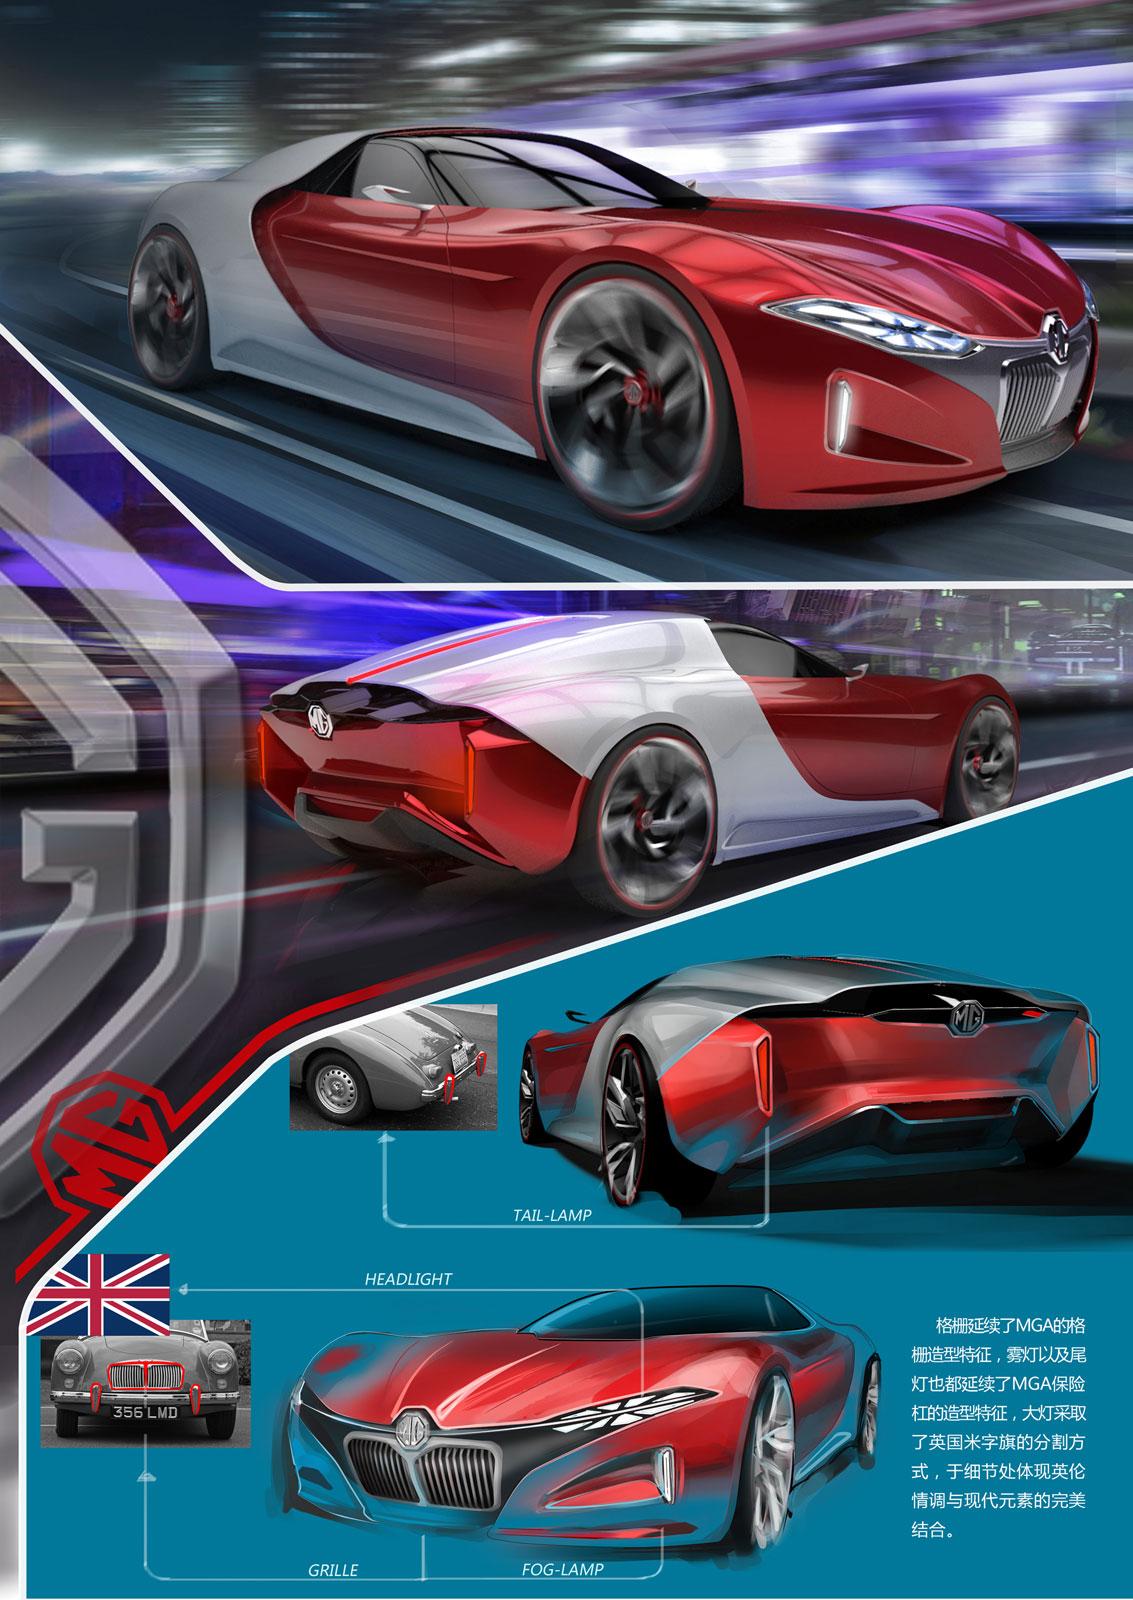 3rd Winner Li Shuo Design Panel Car Body Design